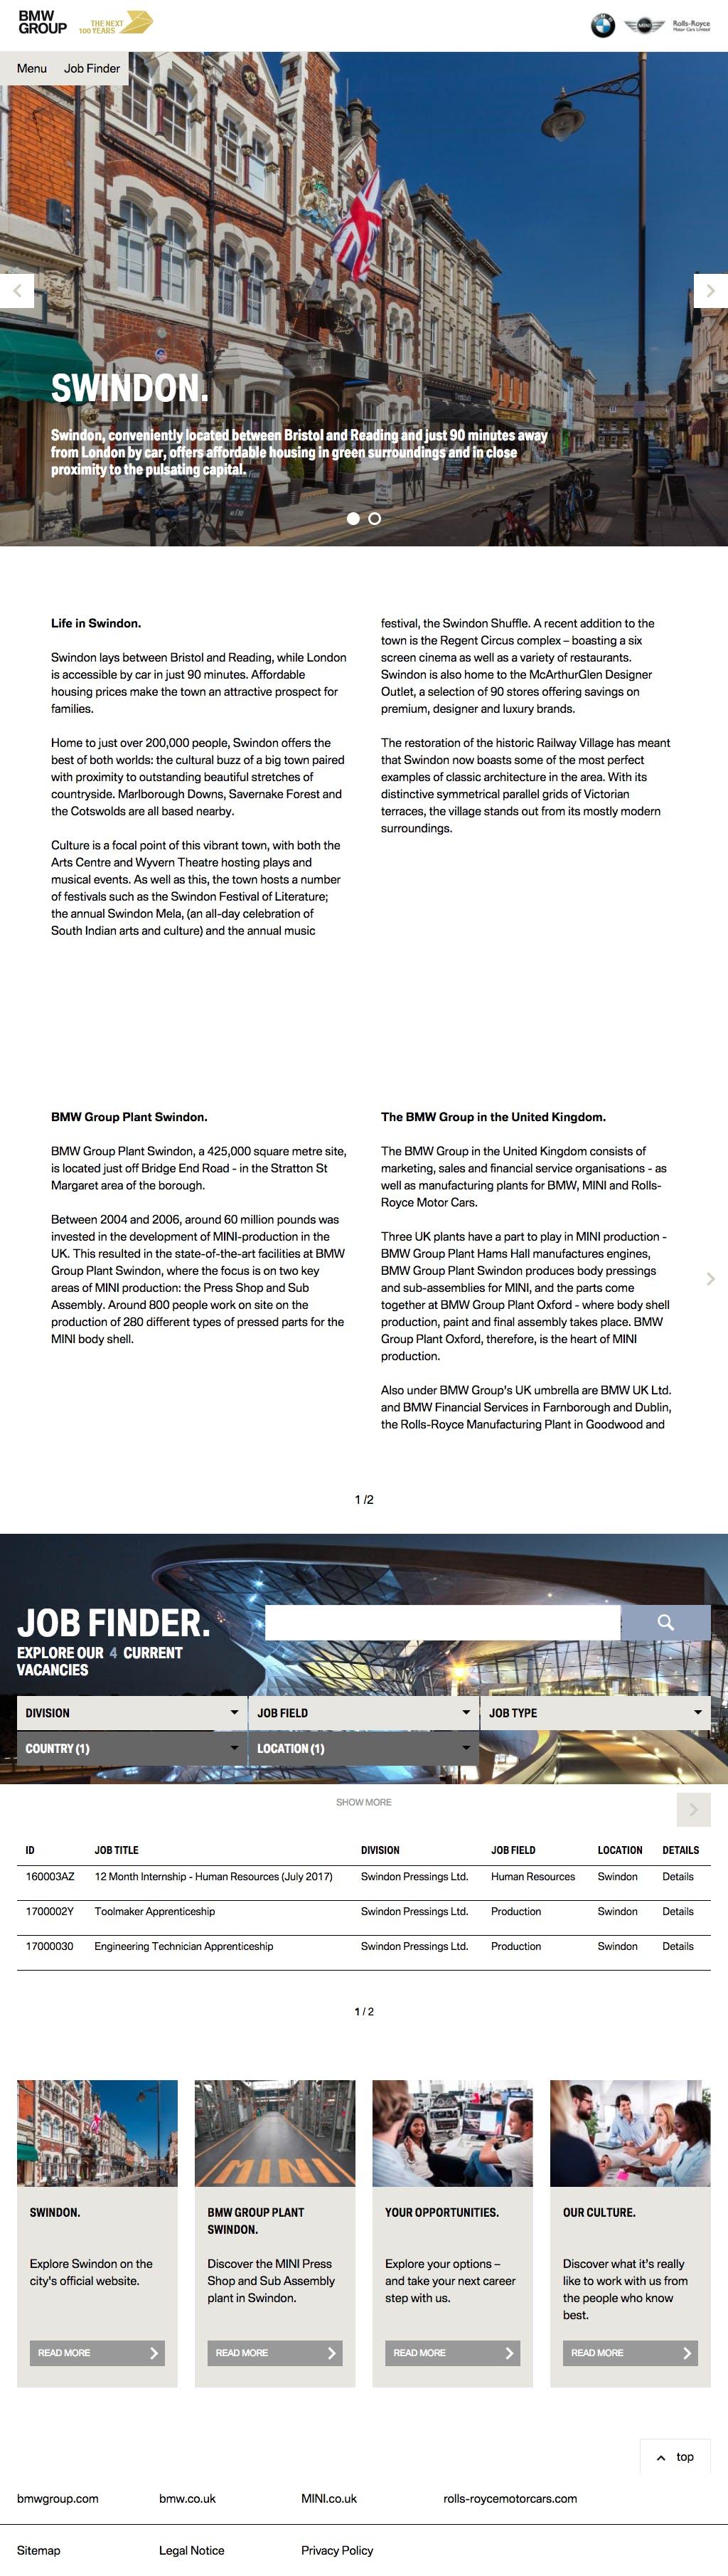 BMW Career Portal City 1024